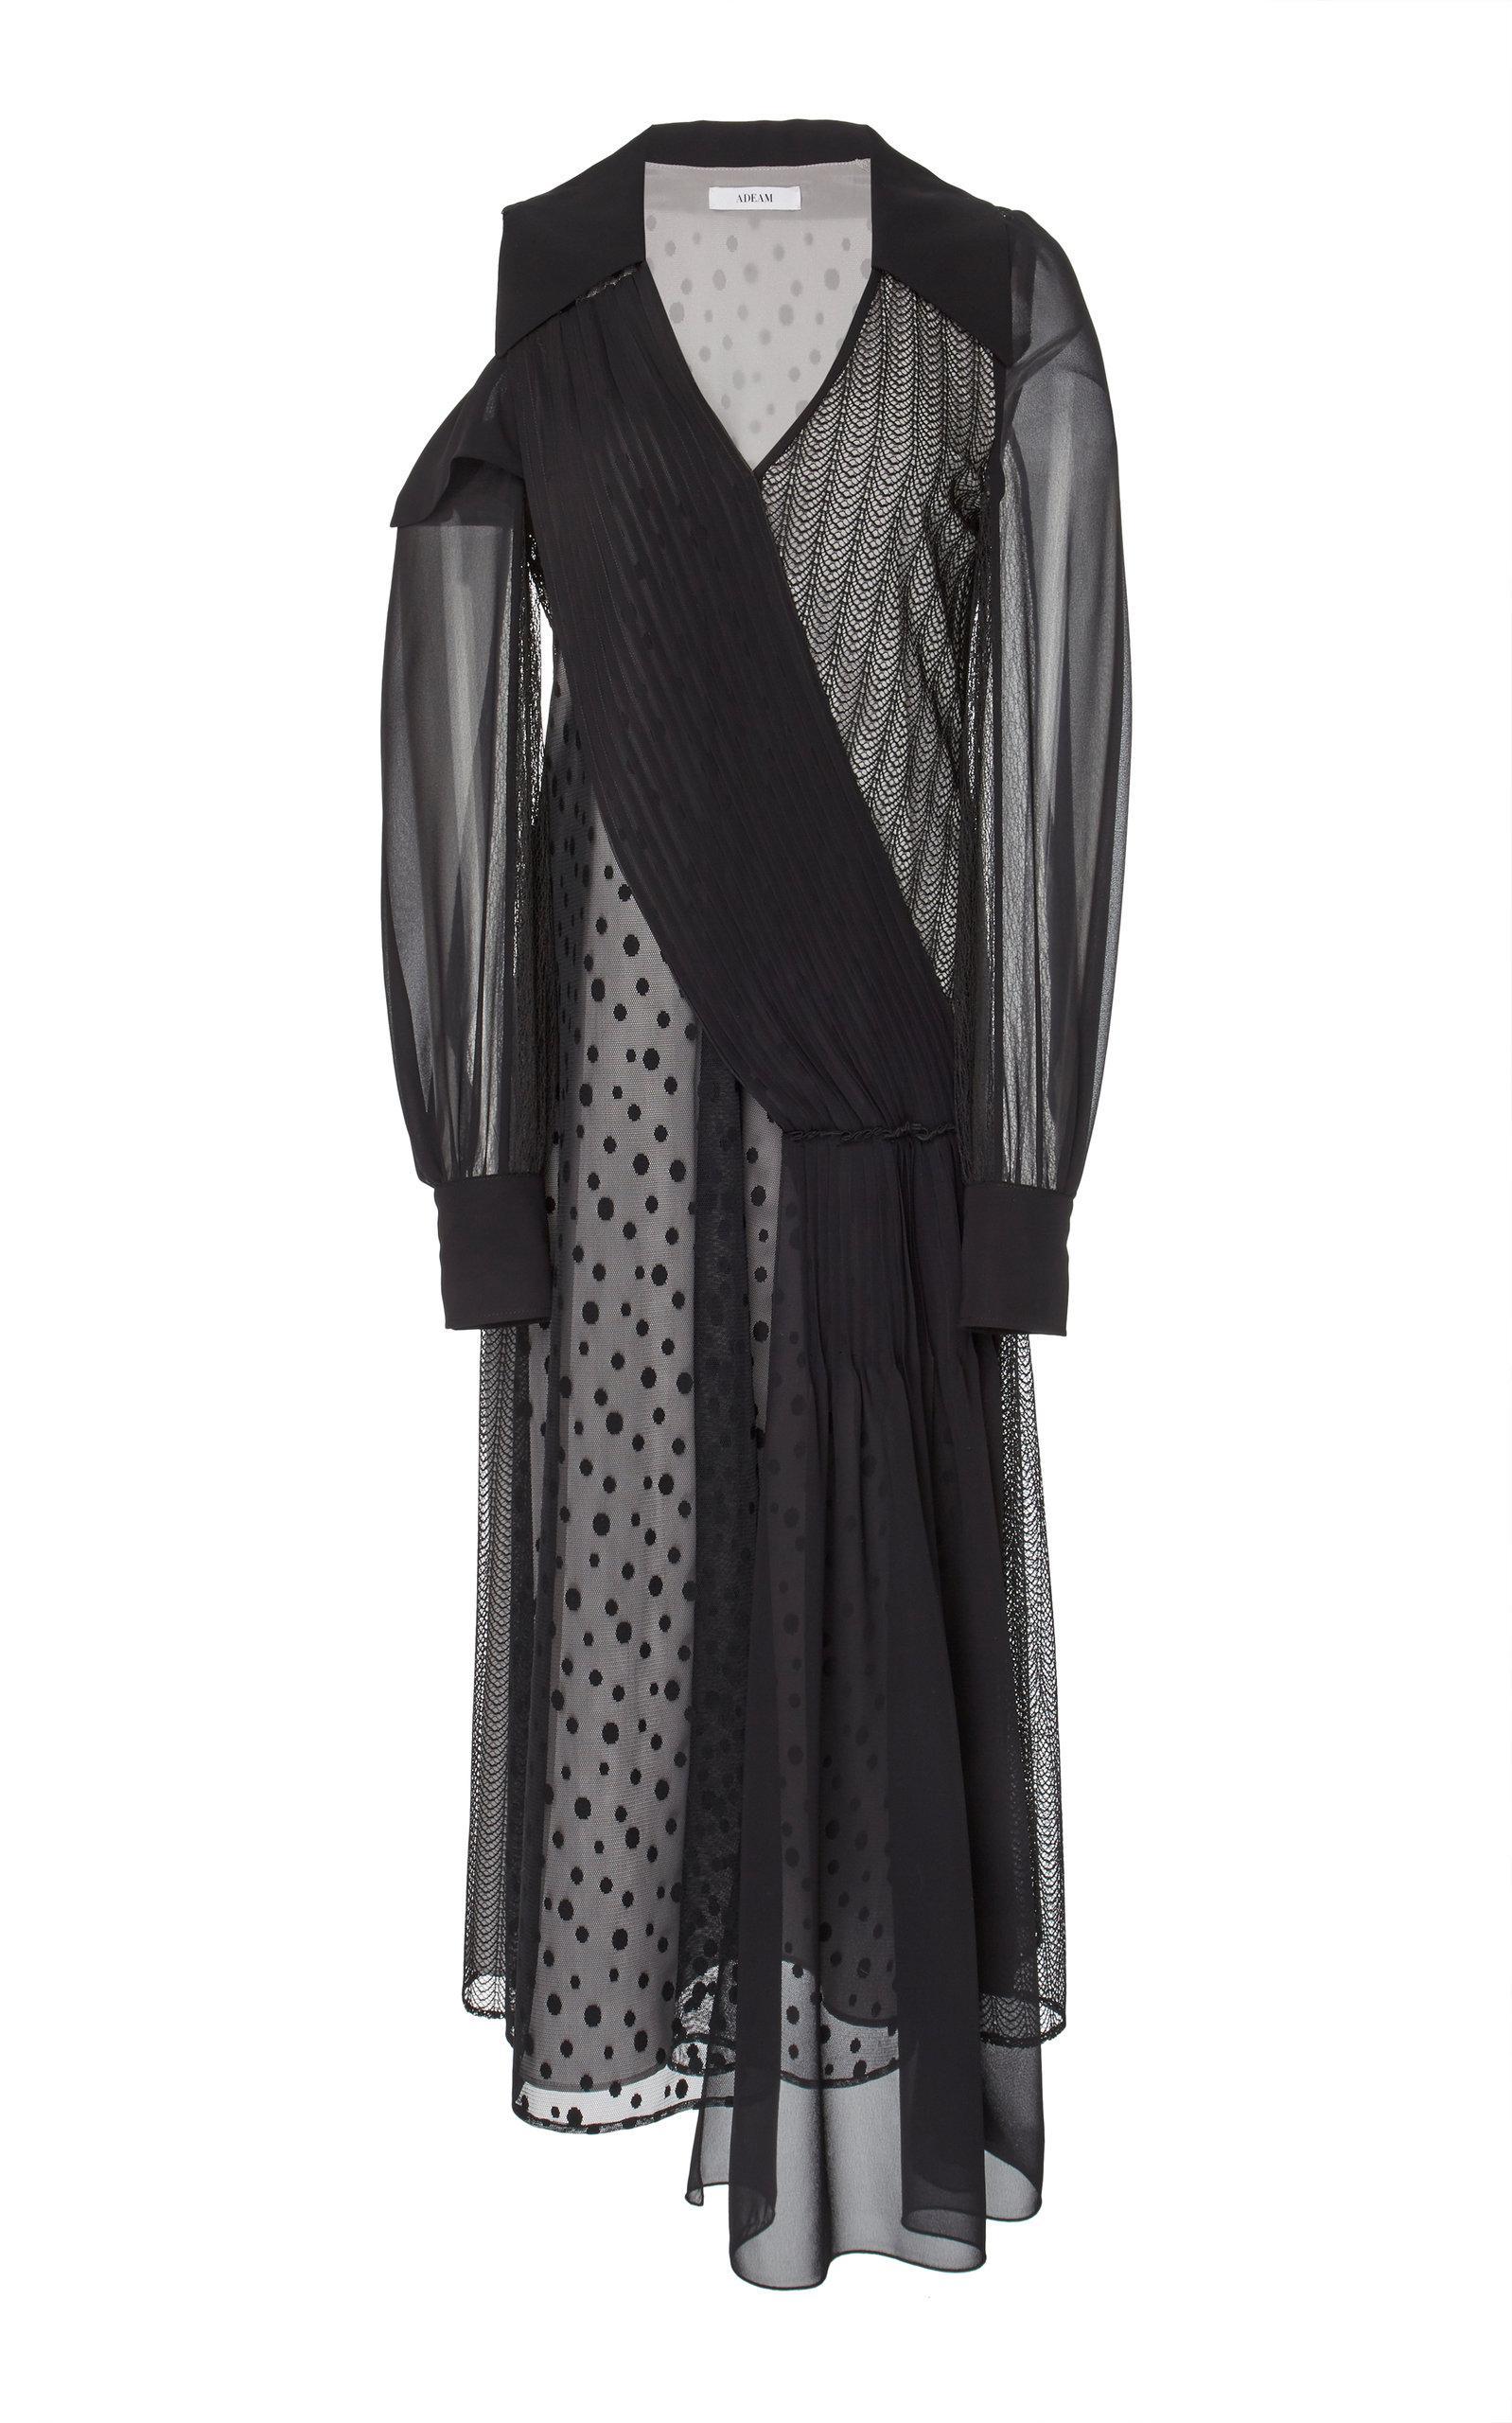 Adeam Art Deco Lace Dress In Black